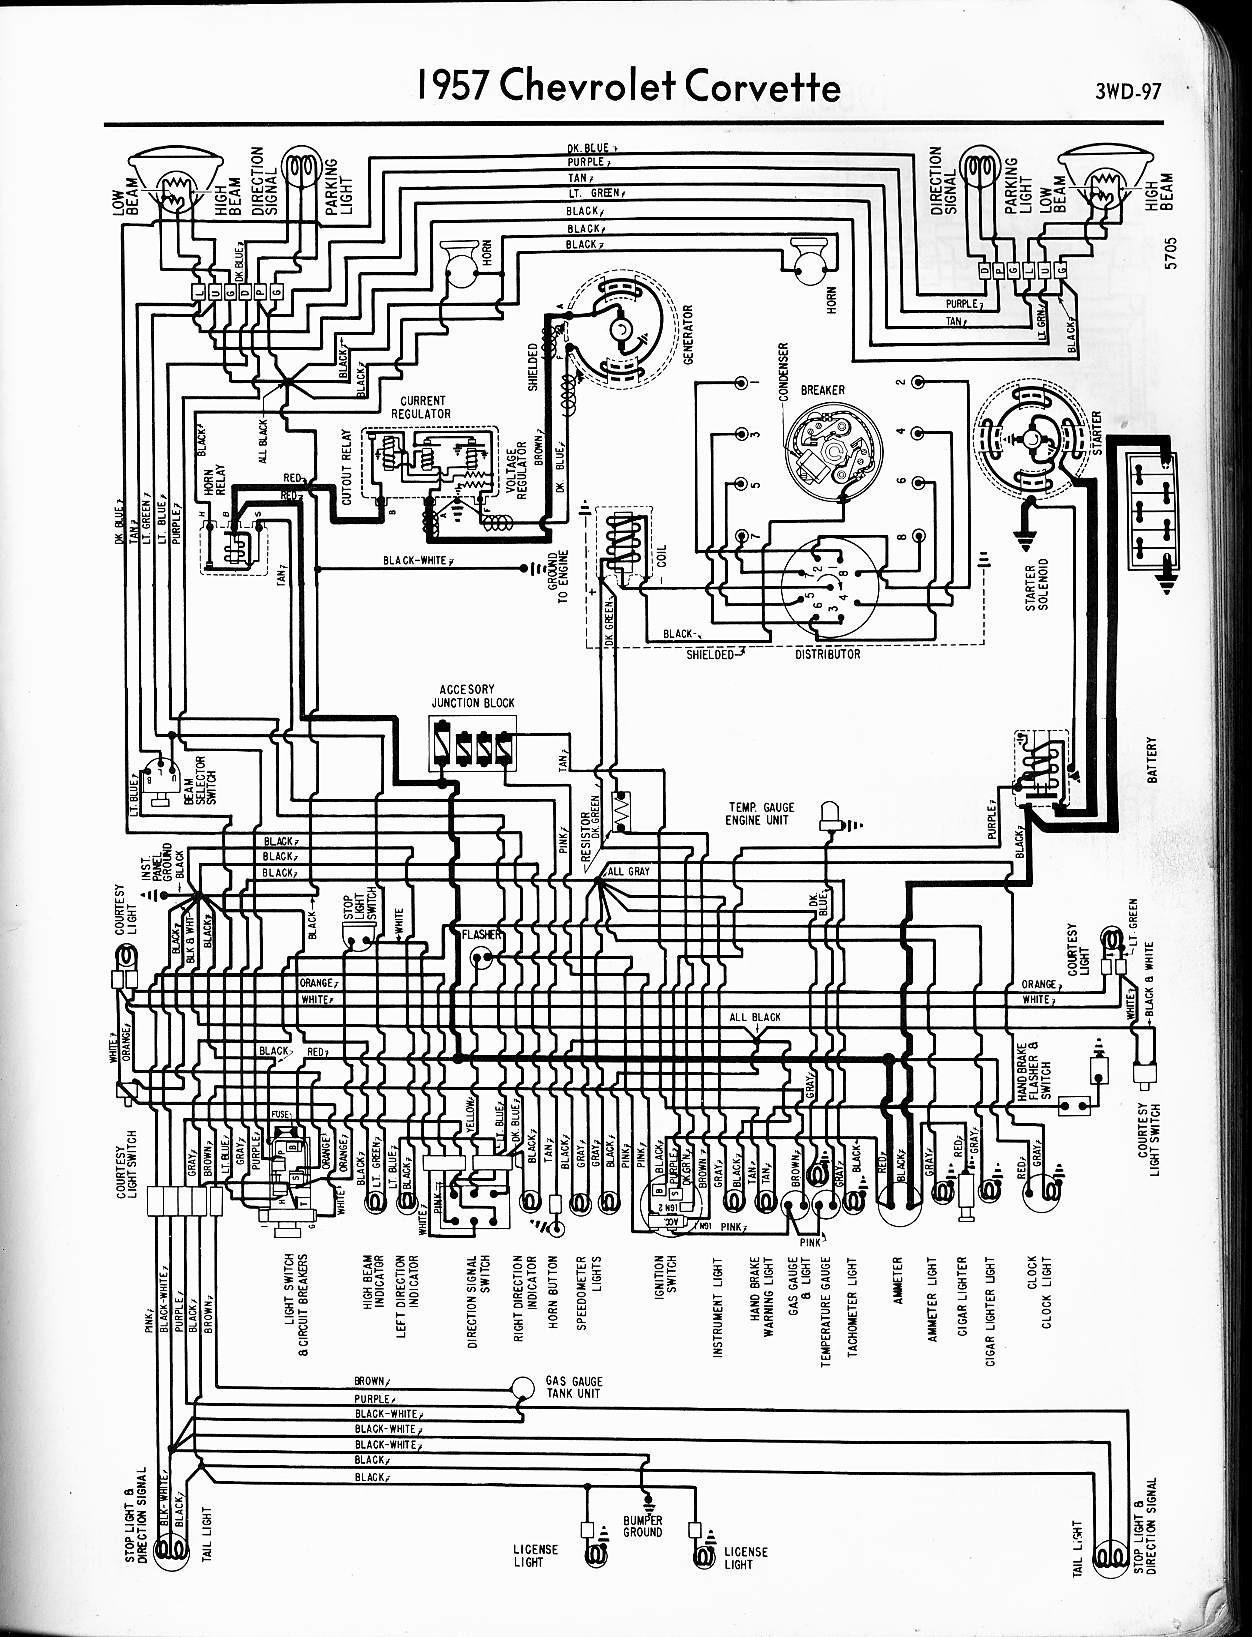 1968 Corvette Wiring Diagram Coil Schematics 1969 Trusted Diagrams Dash